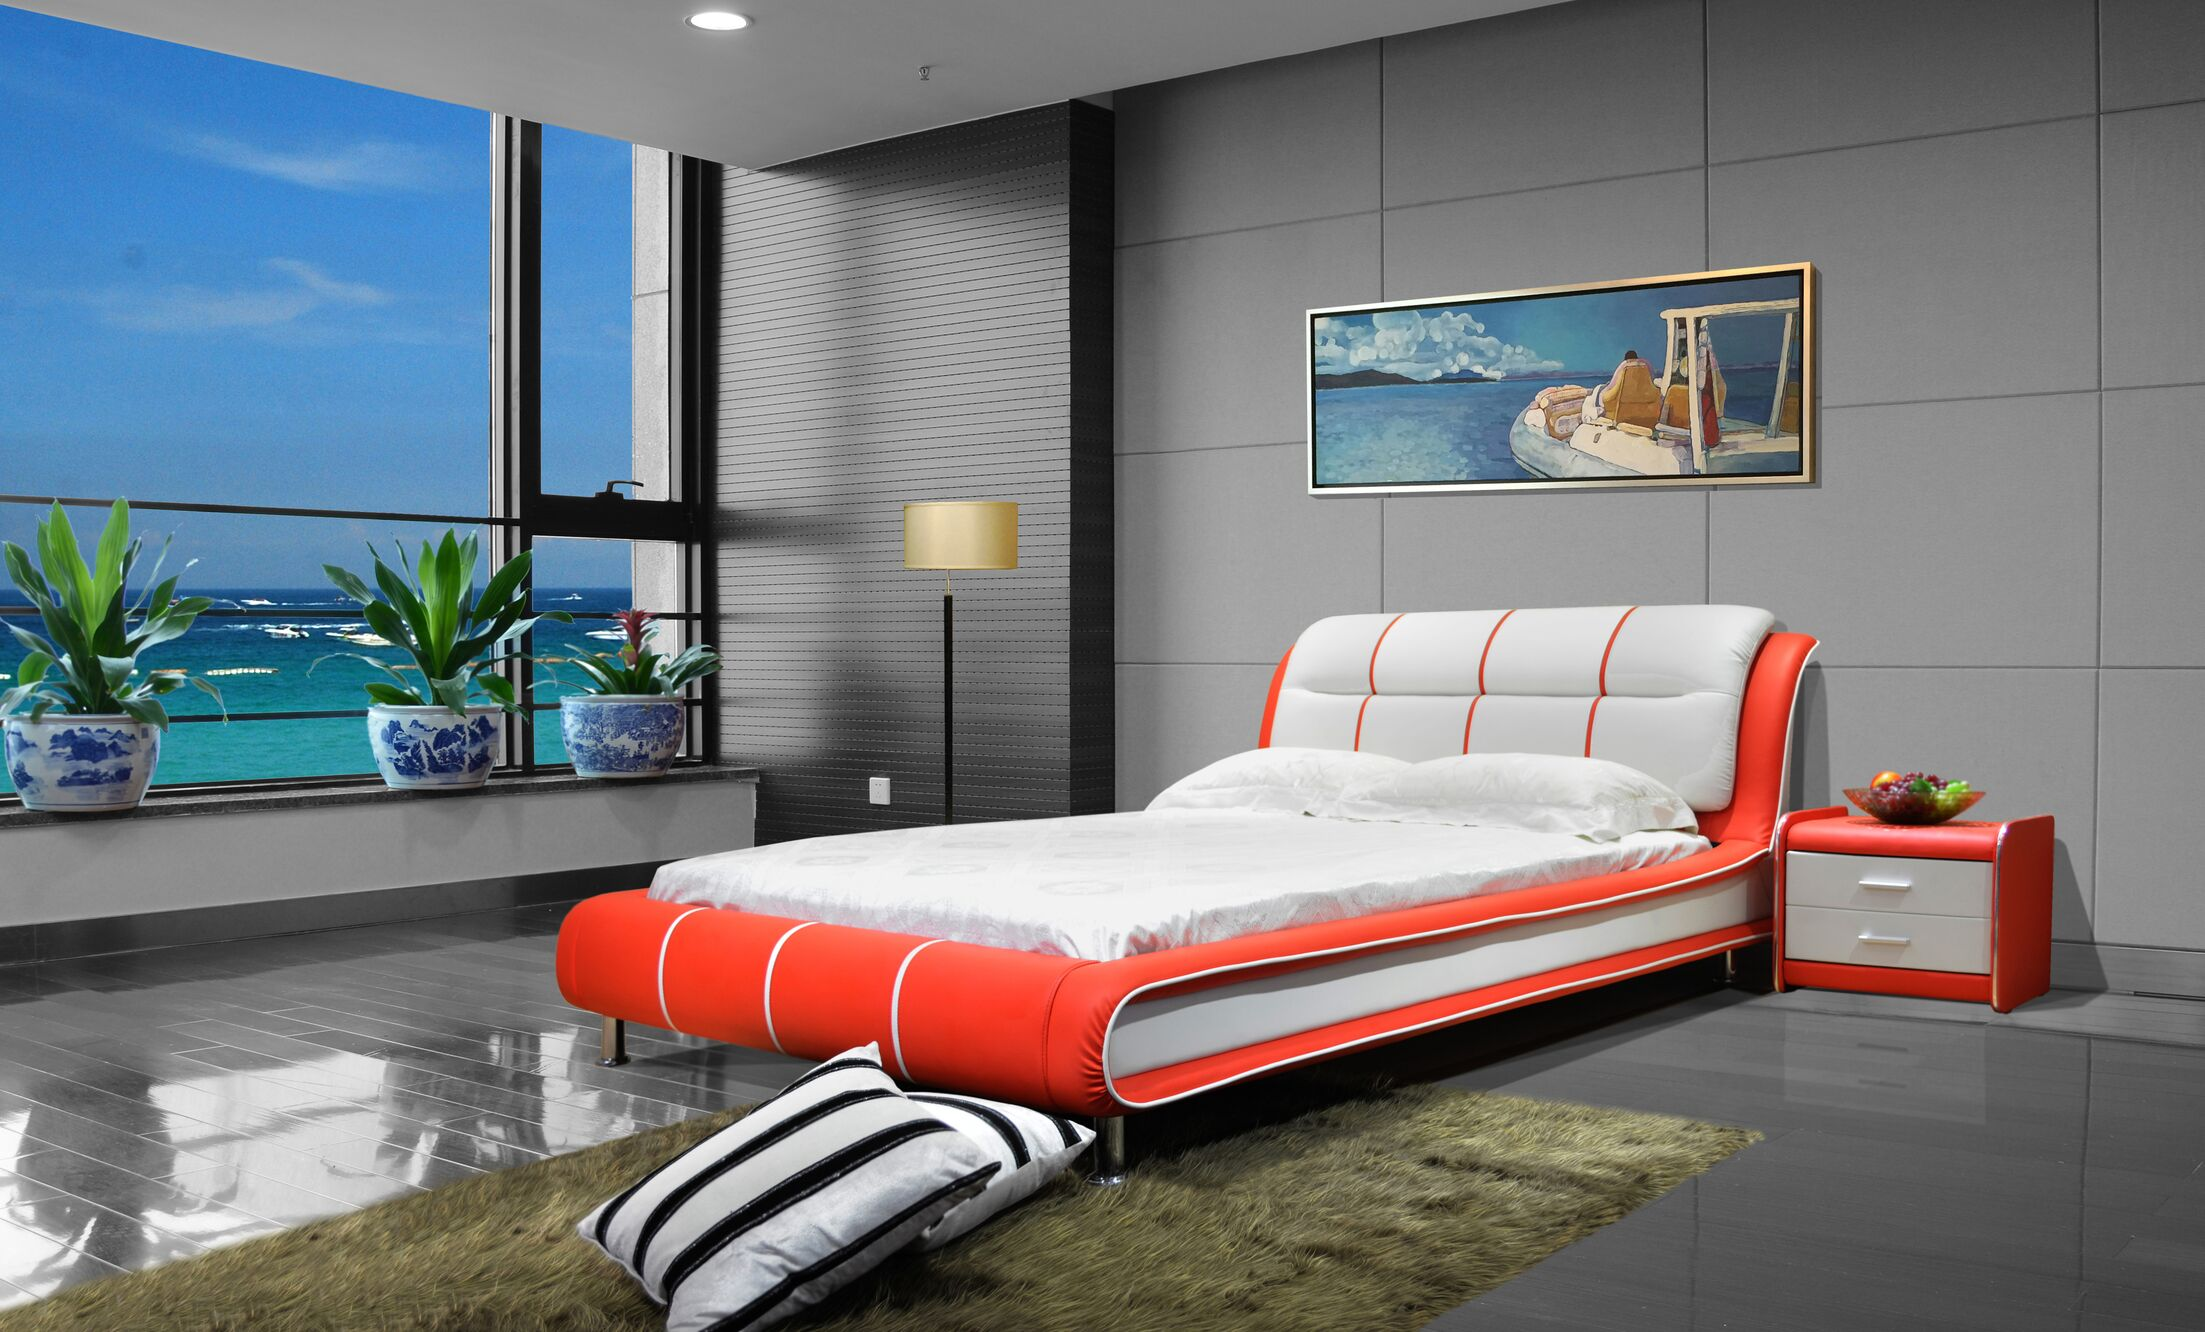 Bovina Upholstered Platform Bed Size: California King, Color: Red / White